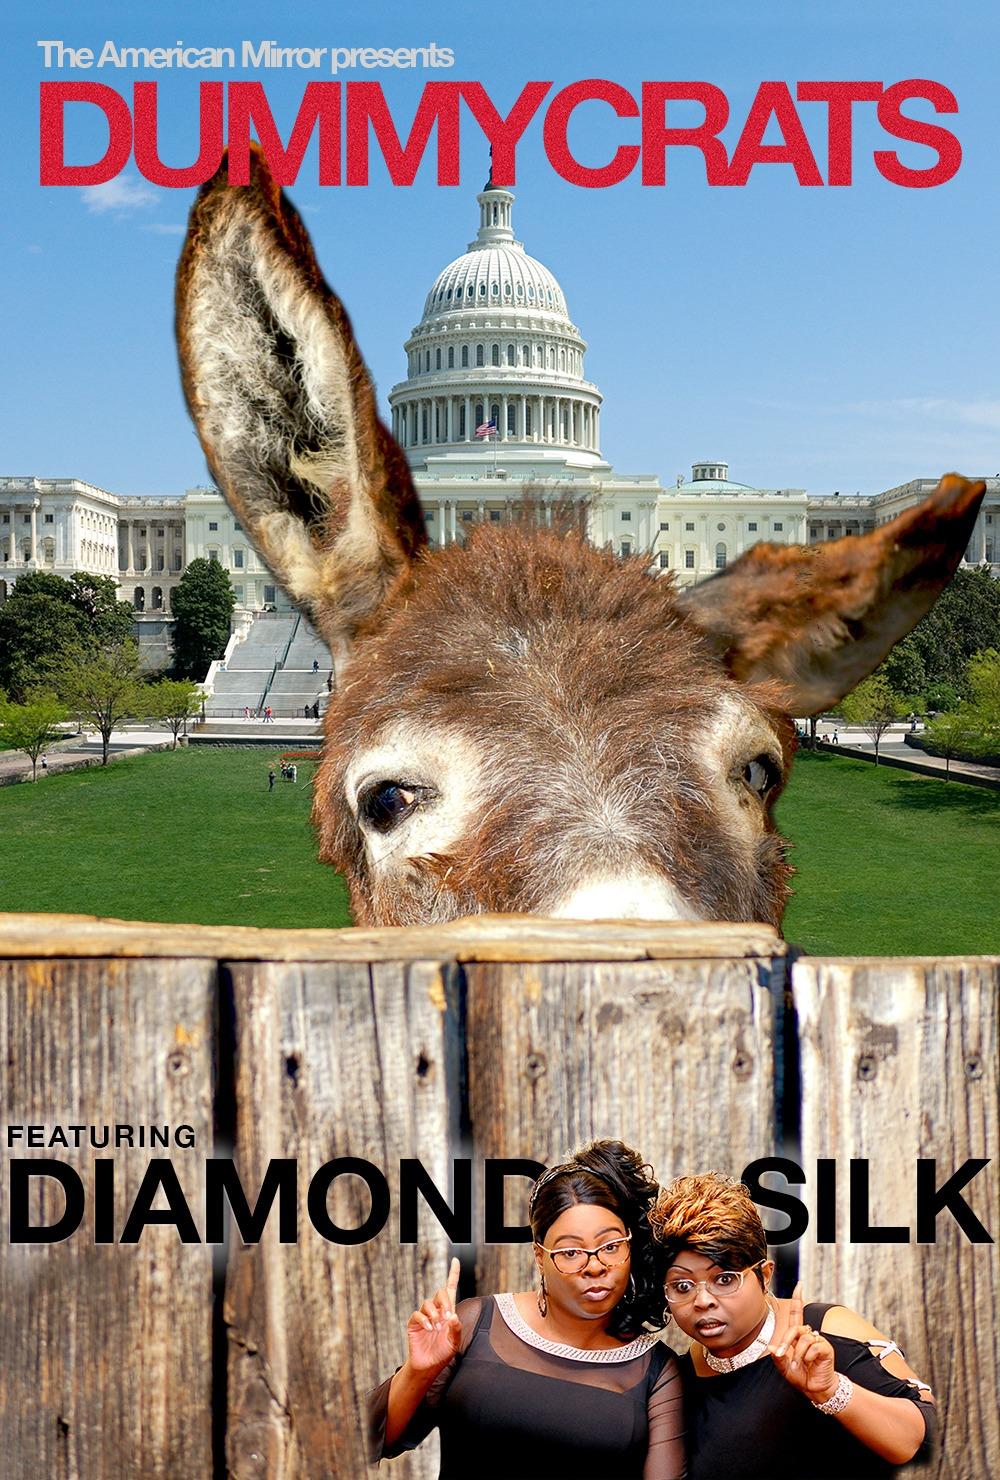 Dummycrats Featuring Diamond & Silk